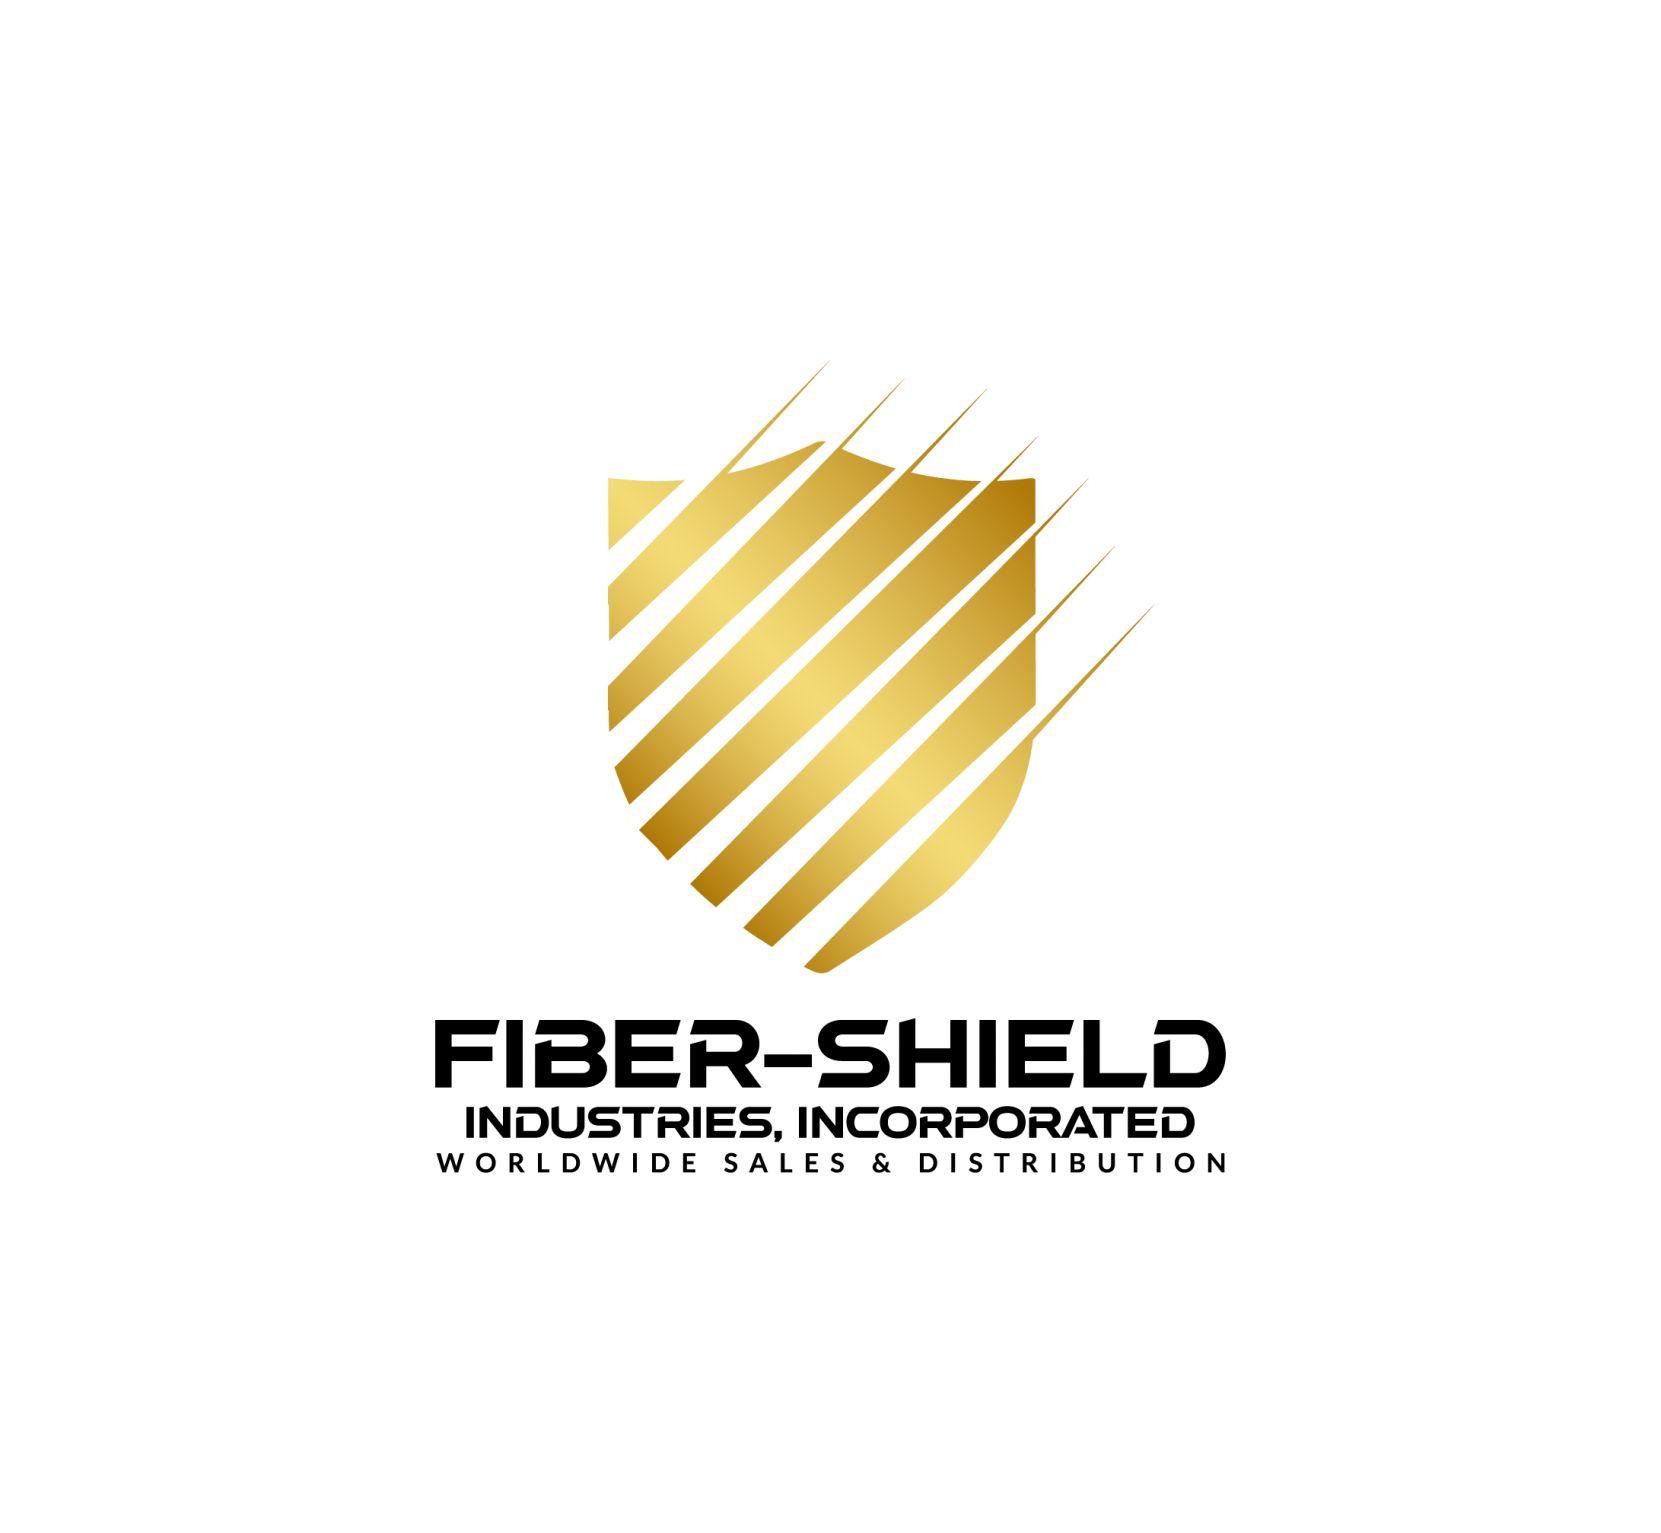 Fiber Shield Industries Has a New Logo